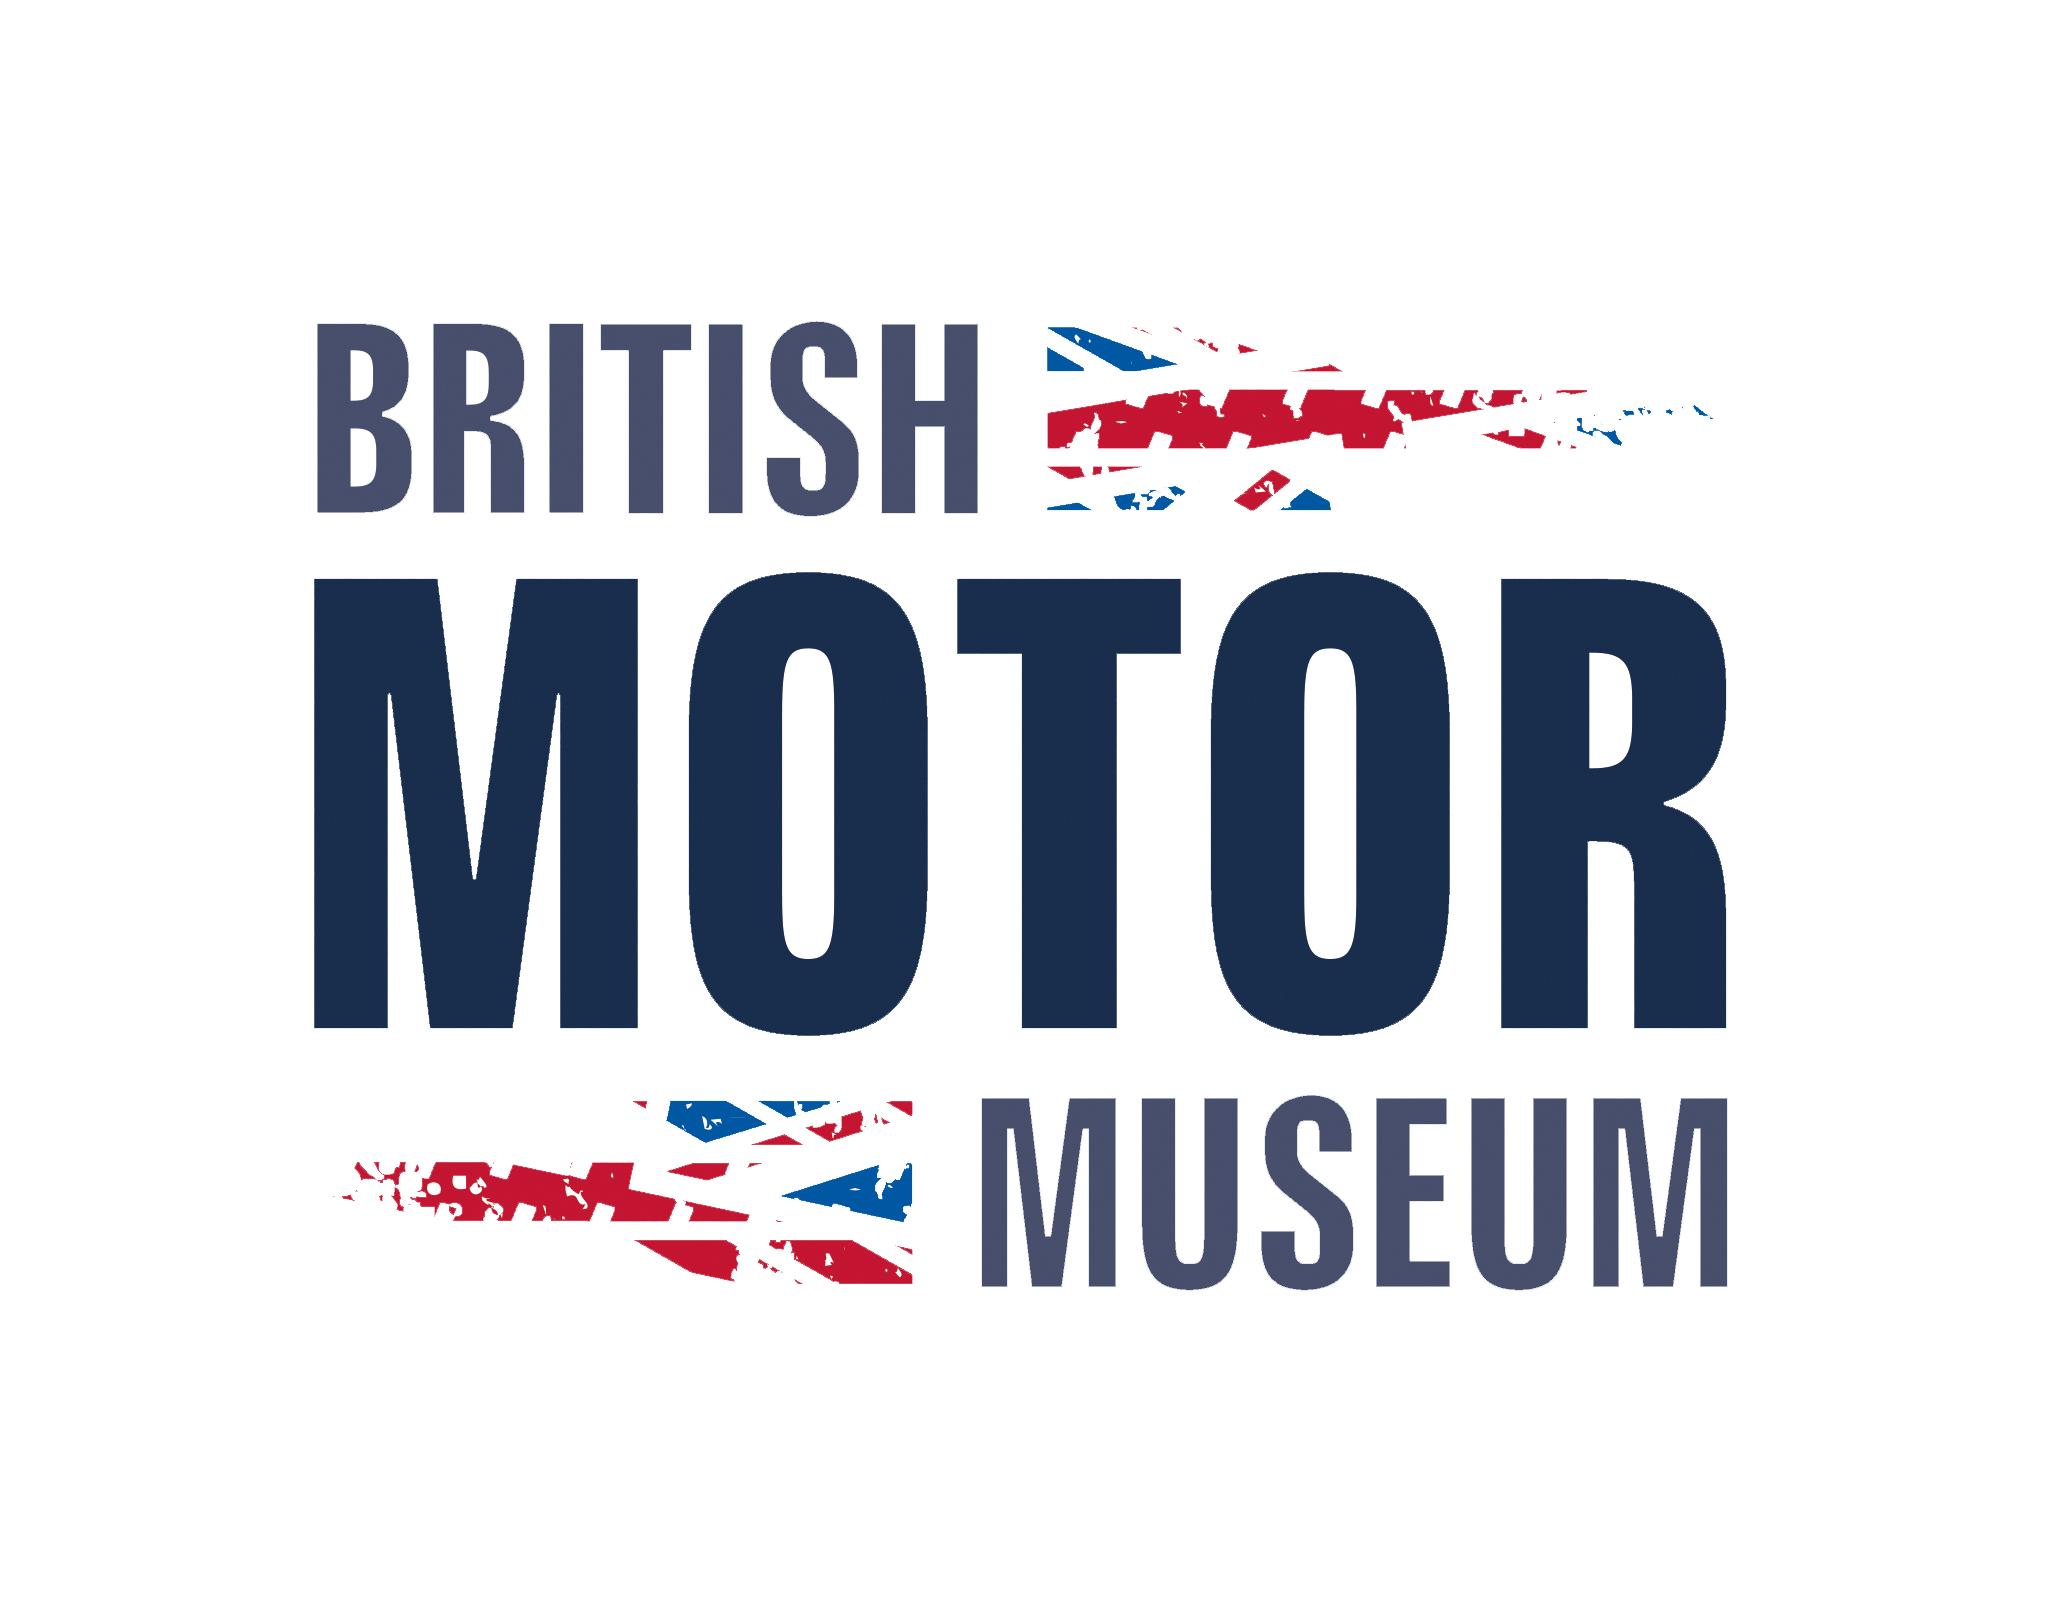 British Motor Museum's logo